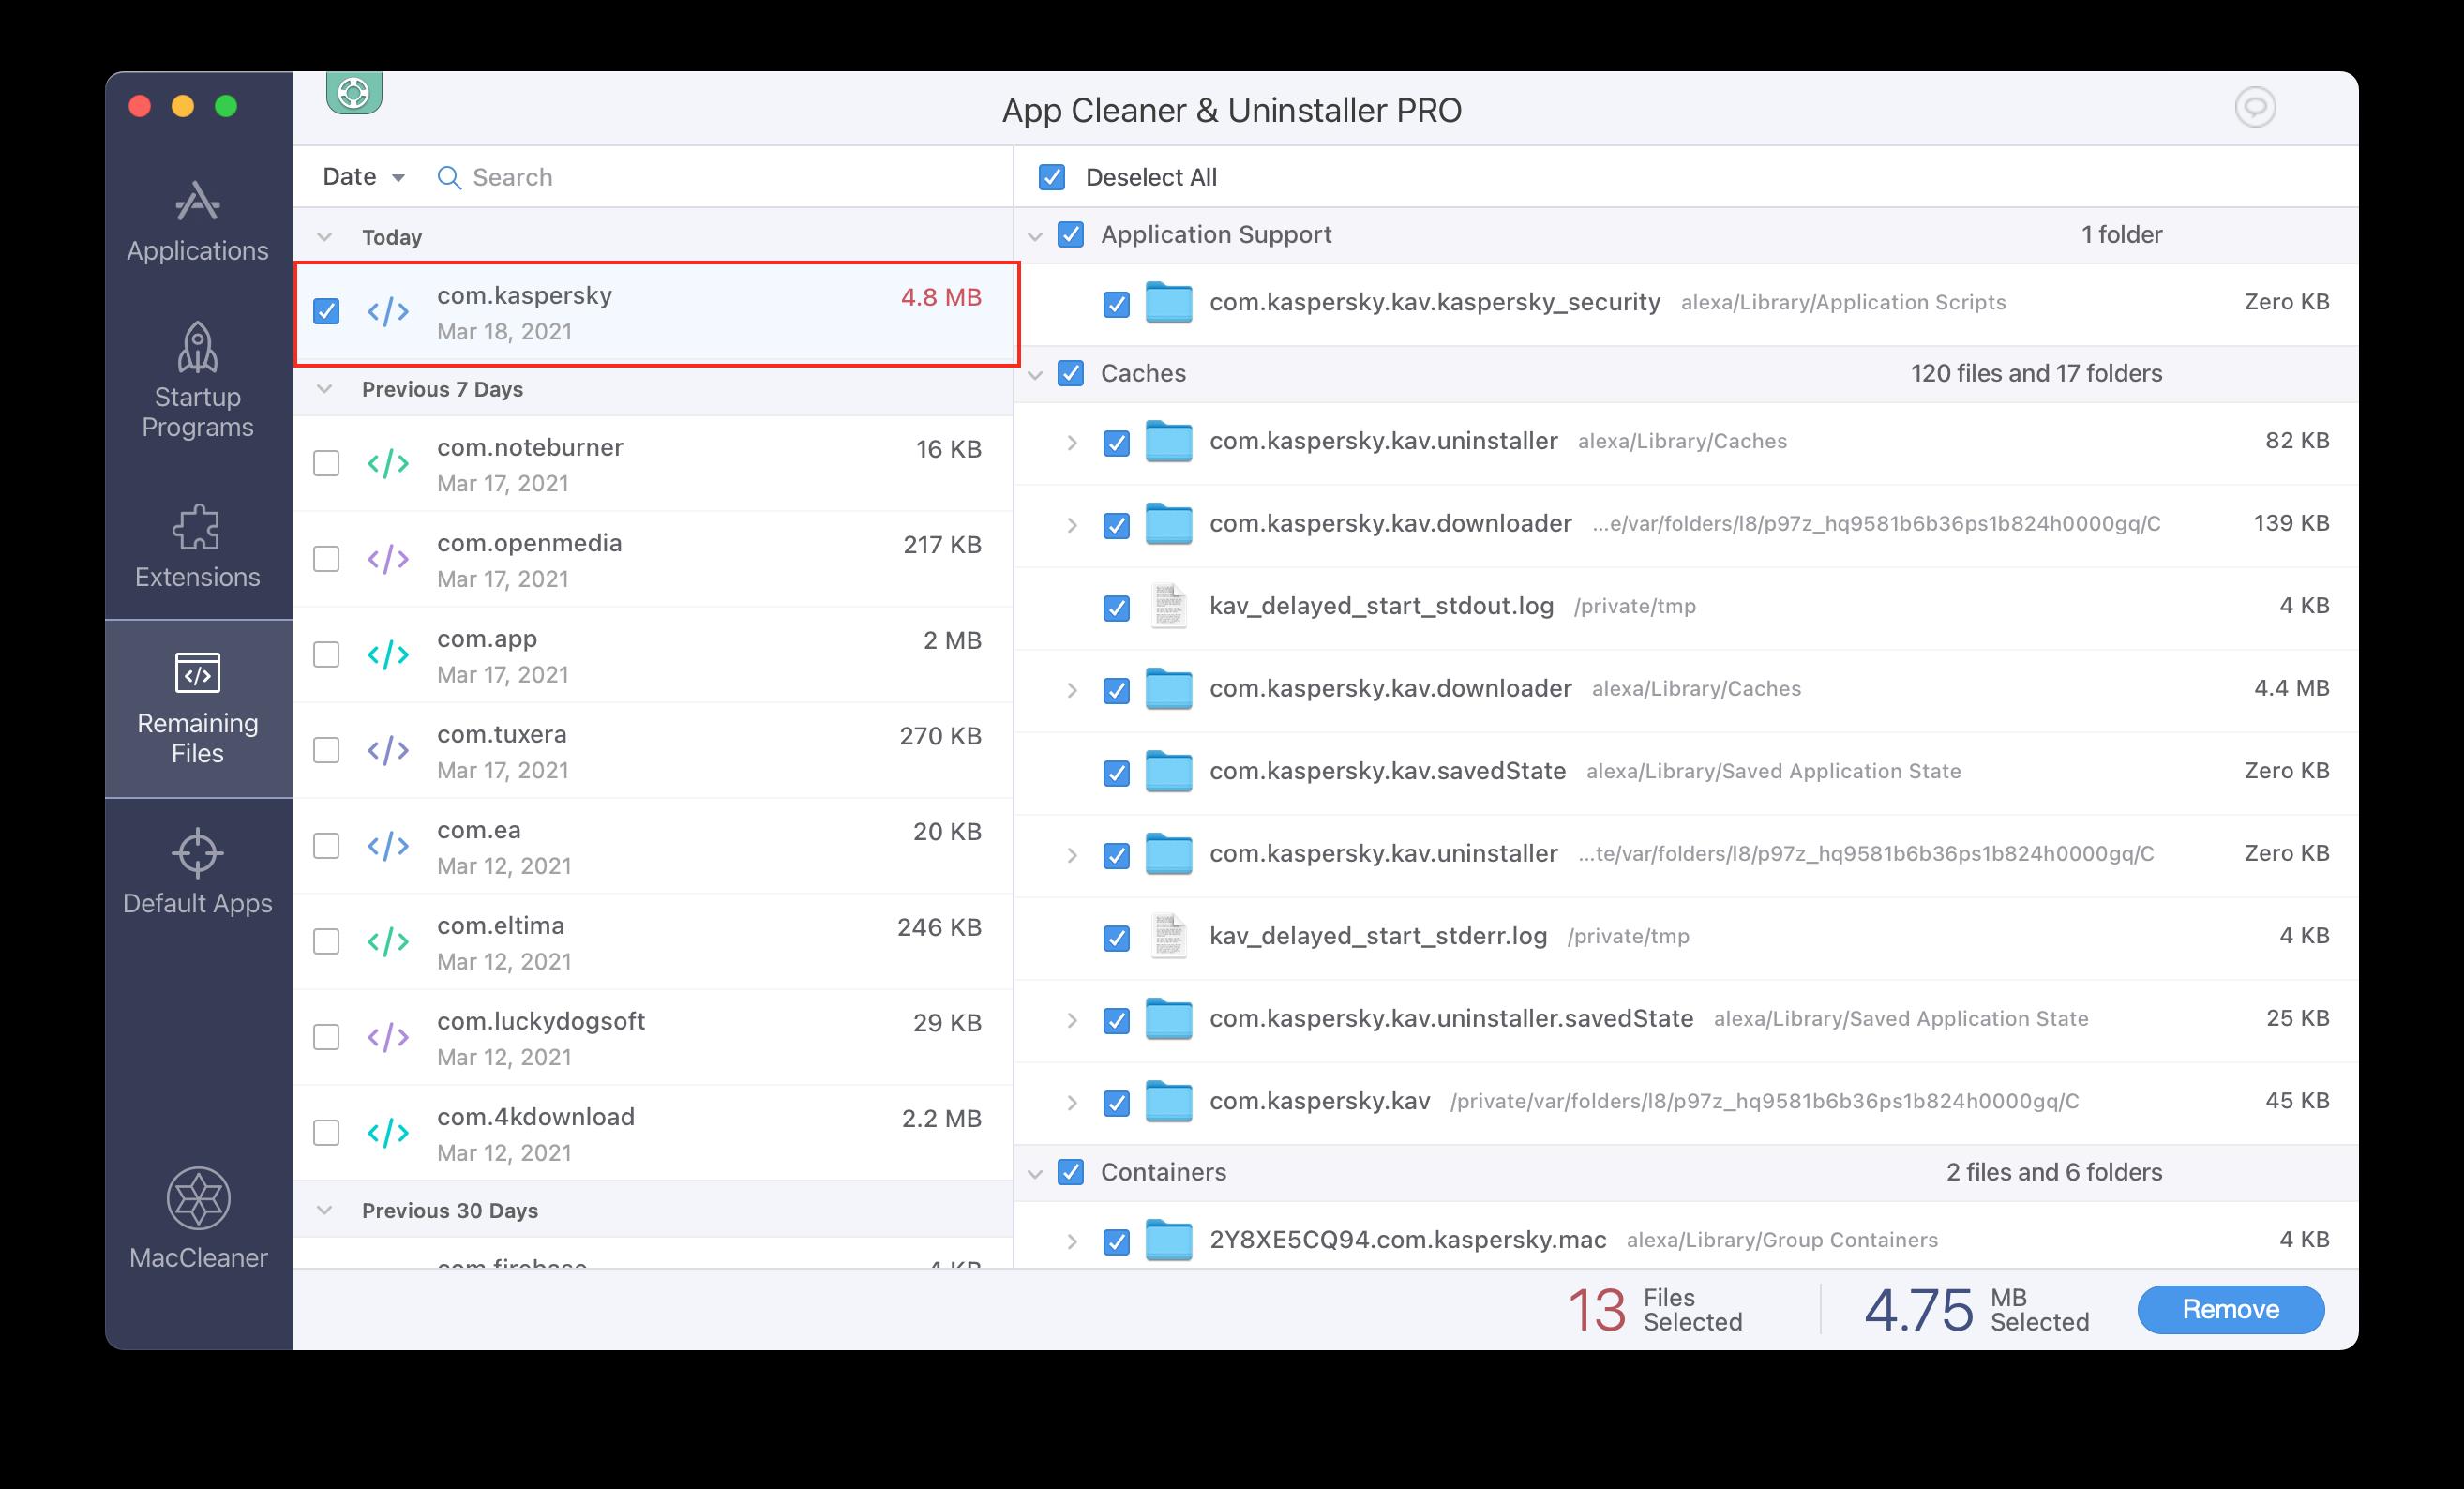 App Cleaner & Uninstaller showing Kaspersky's remaining files